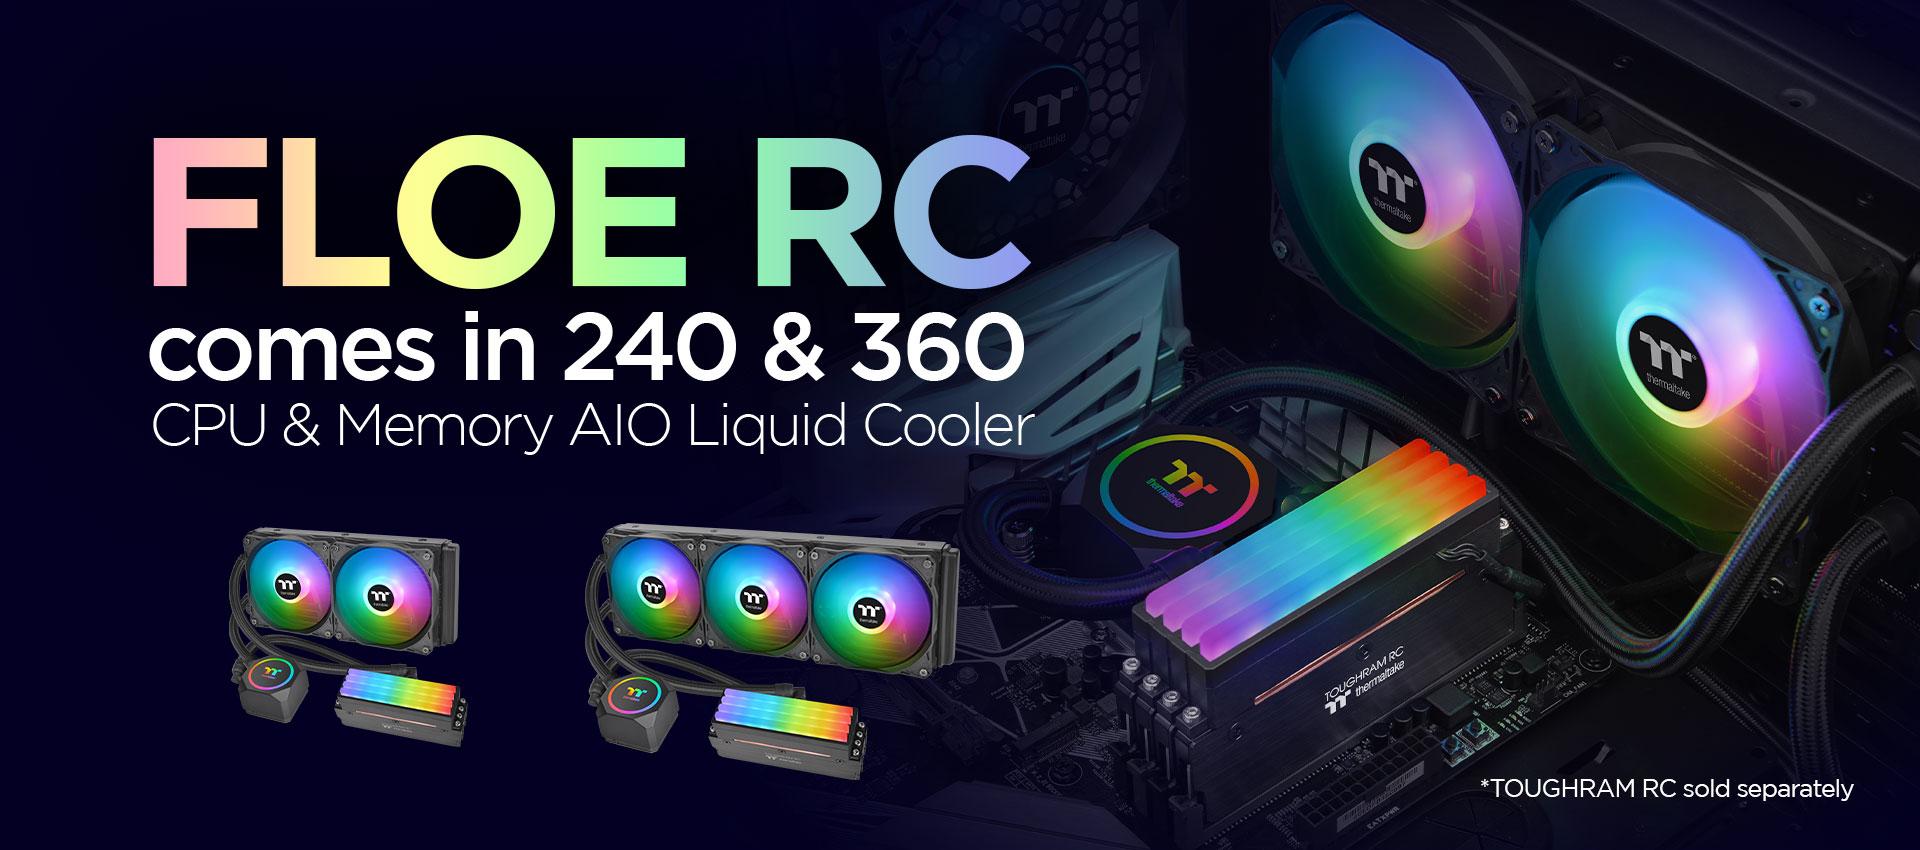 floe-rc240